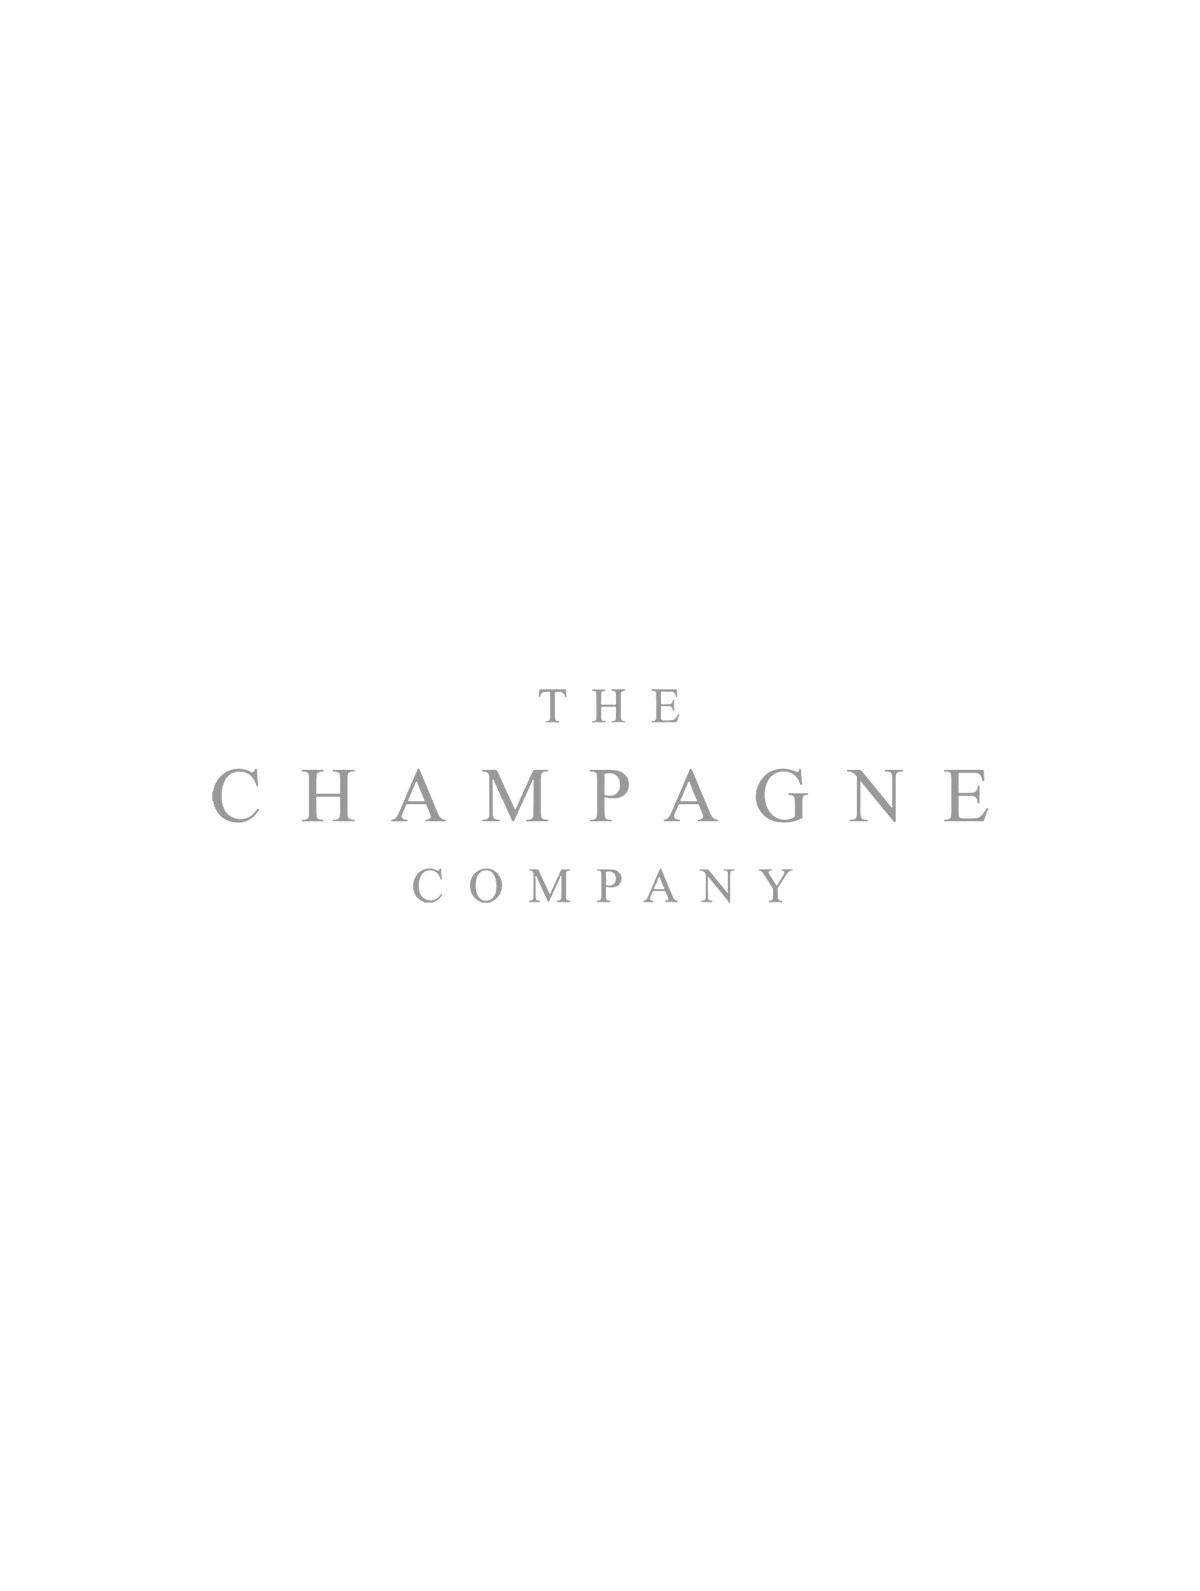 Roda Reserva 2011 Rioja Wine & LSA Red Wine Goblet Glasses Wine Gift